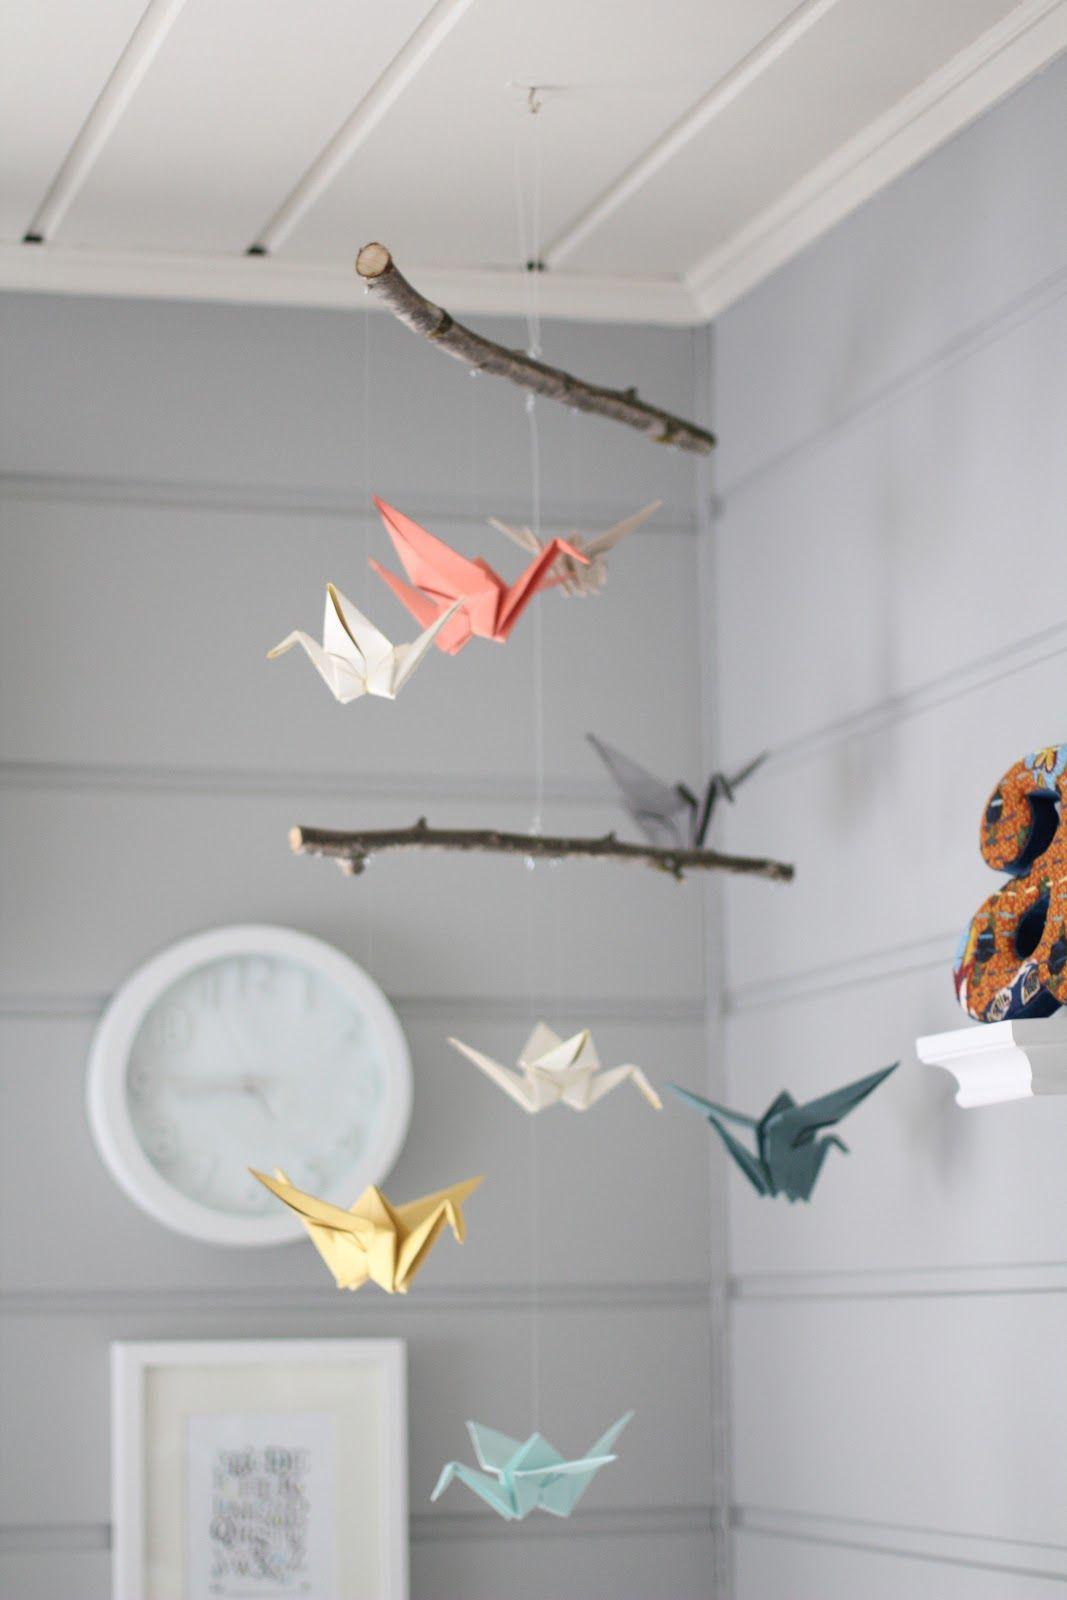 Origami crane crane origami craft ideas - Life In Bridgetown Nursery Projects Origami Bird Baby Mobile Origami Birdsorigami Cranesdiy